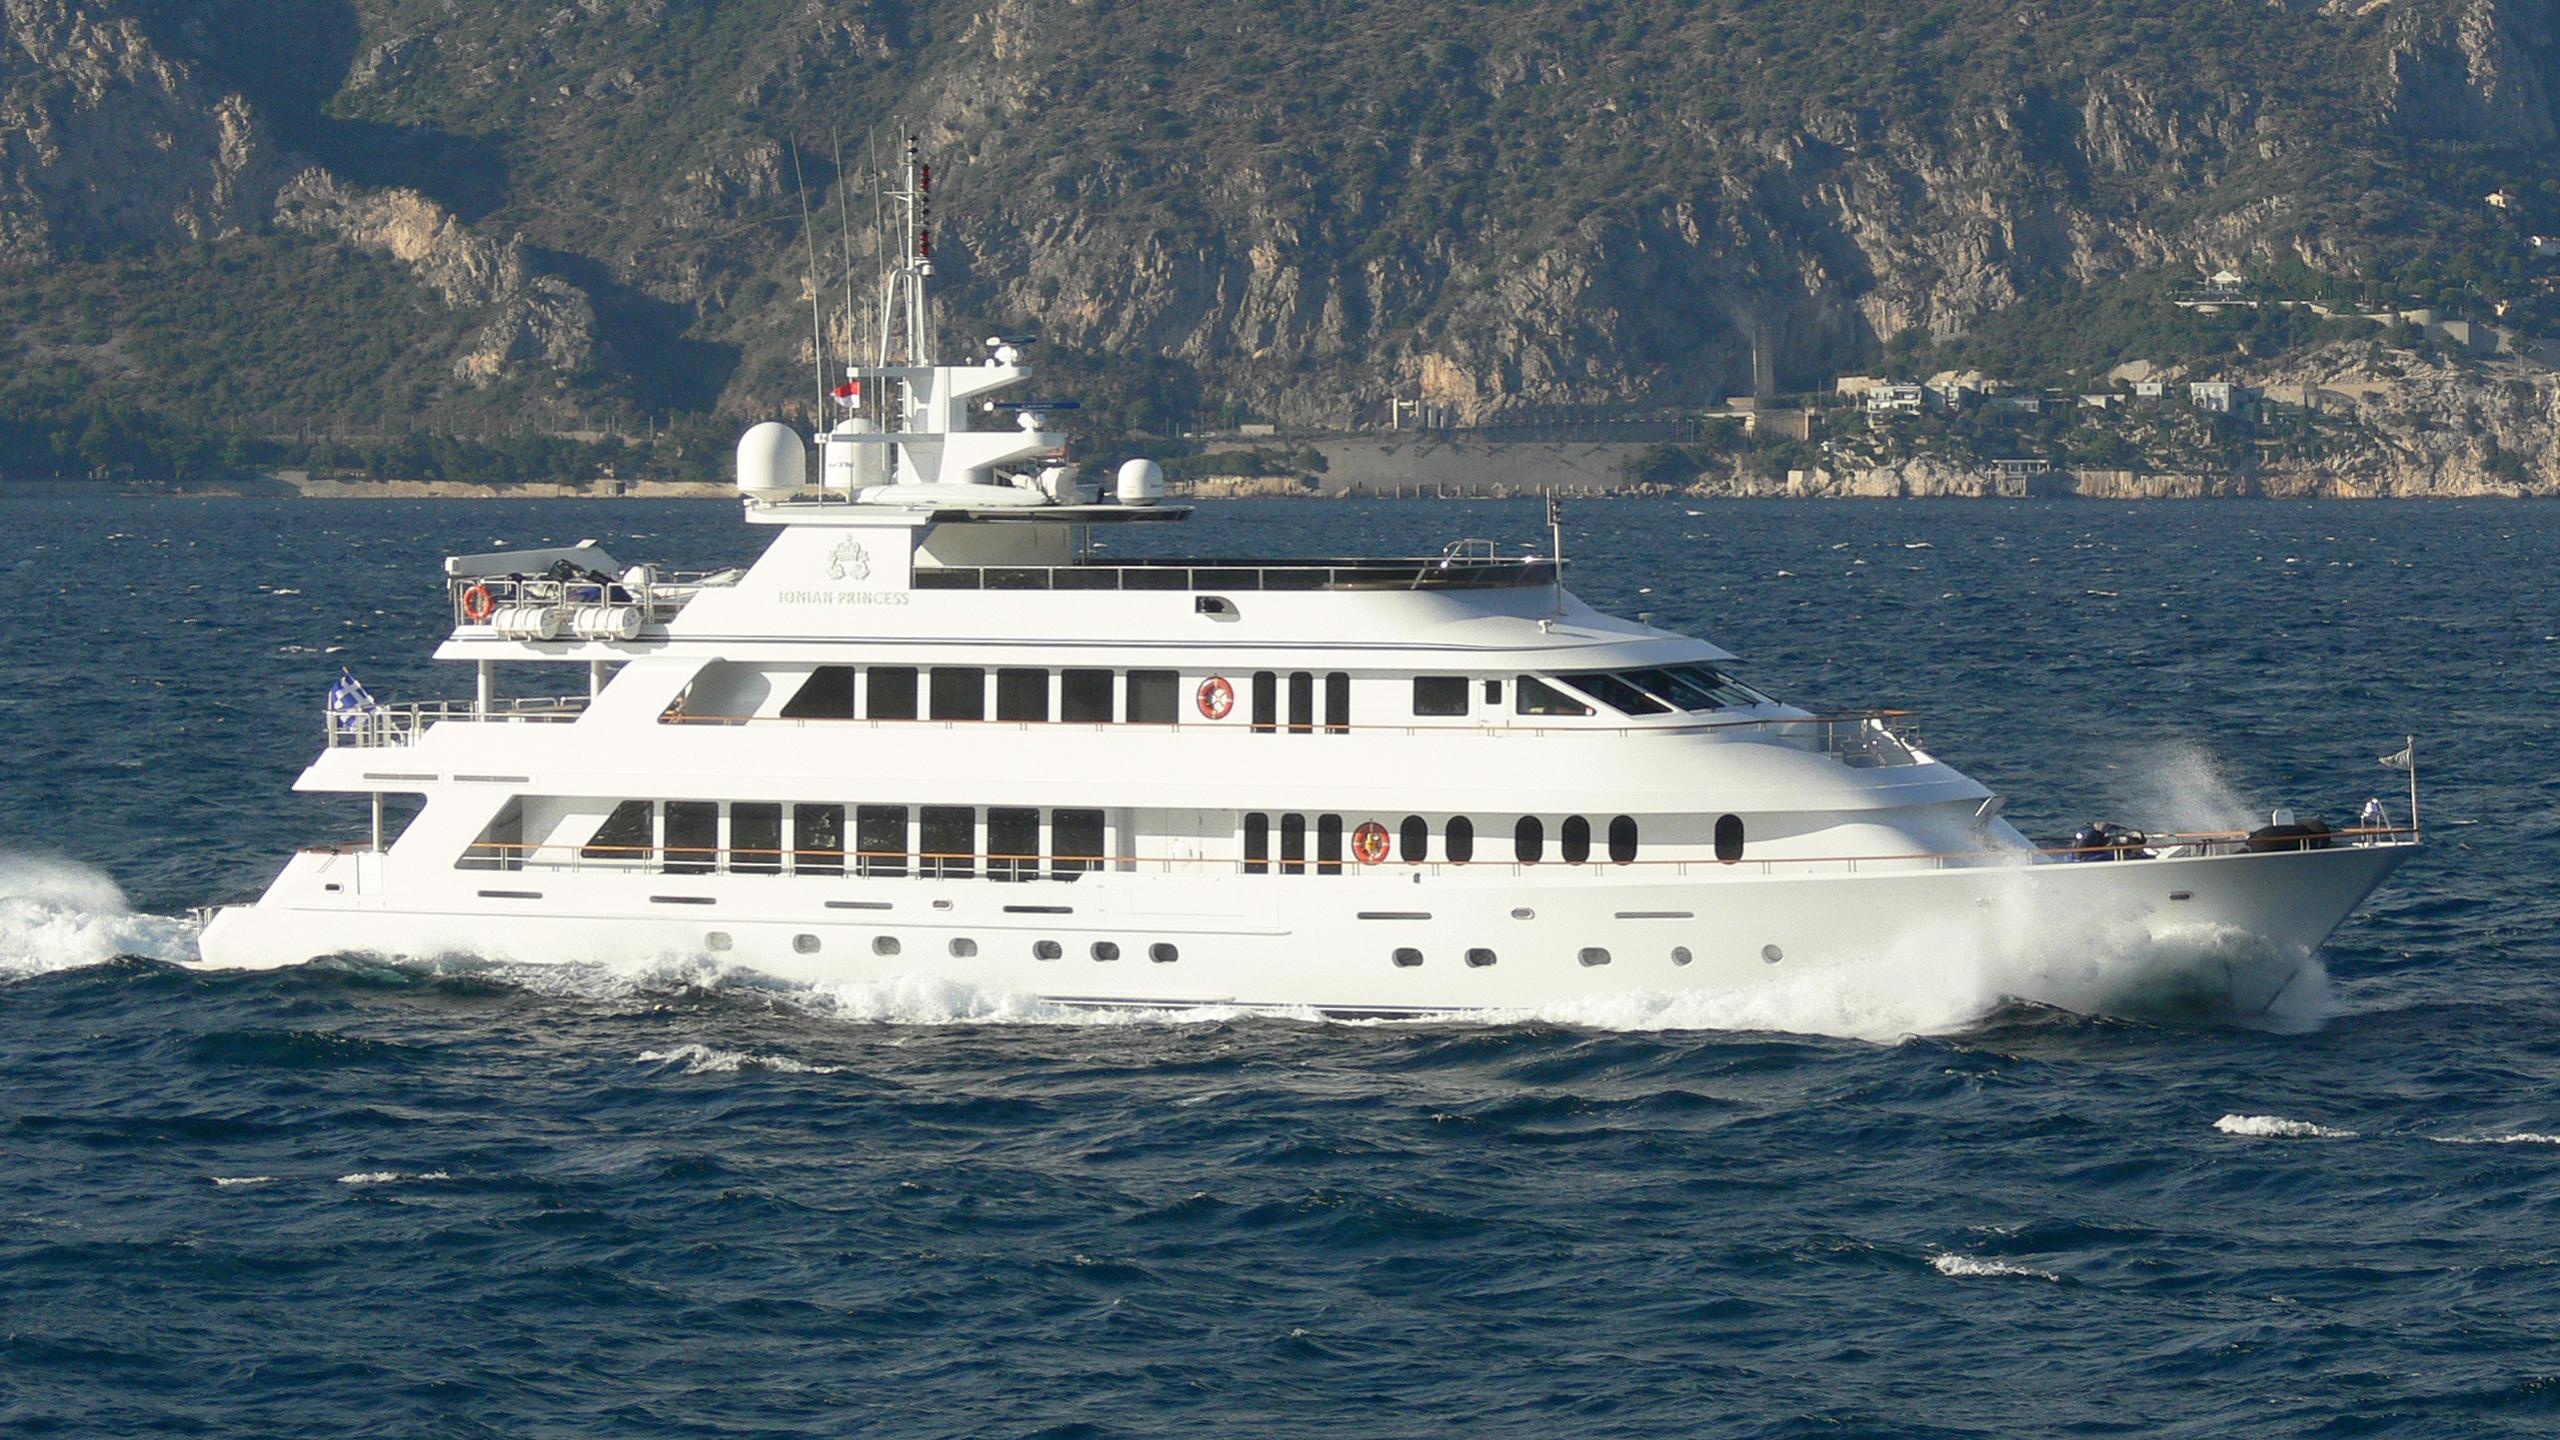 ionian-princess-motor-yacht-christensen-palmer-johnson-savannah-2005-46m-cruising